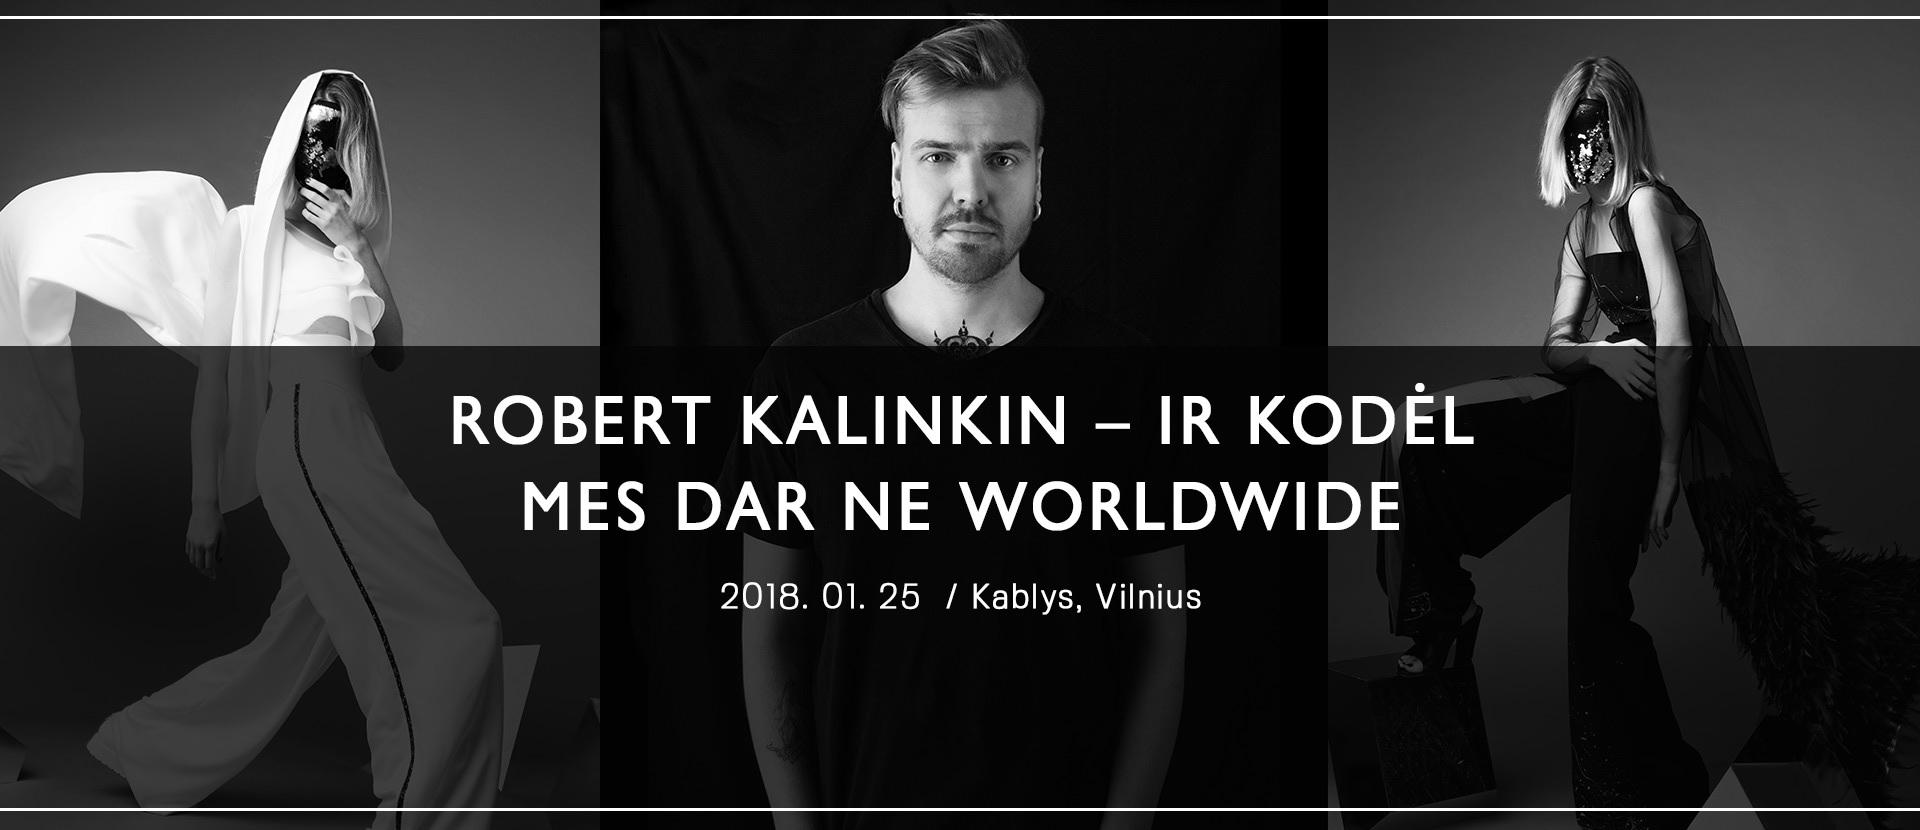 Robert Kalinkin - Ir kodėl mes dar ne worldwide